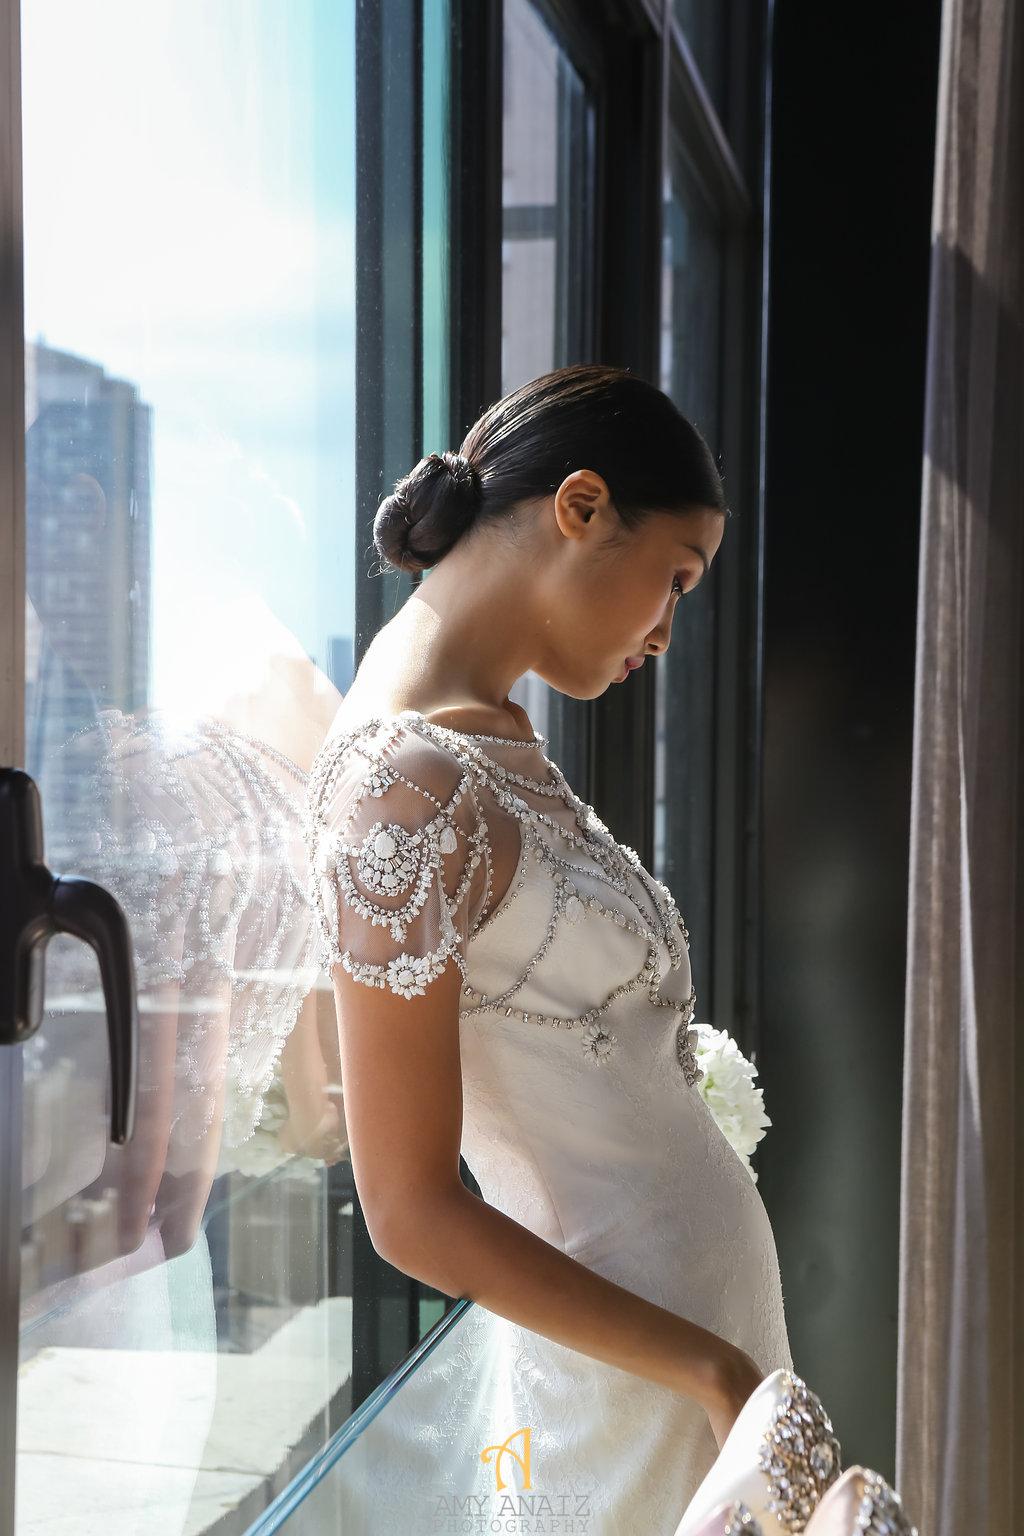 Bridal fashion week recap- badgley mischka 12